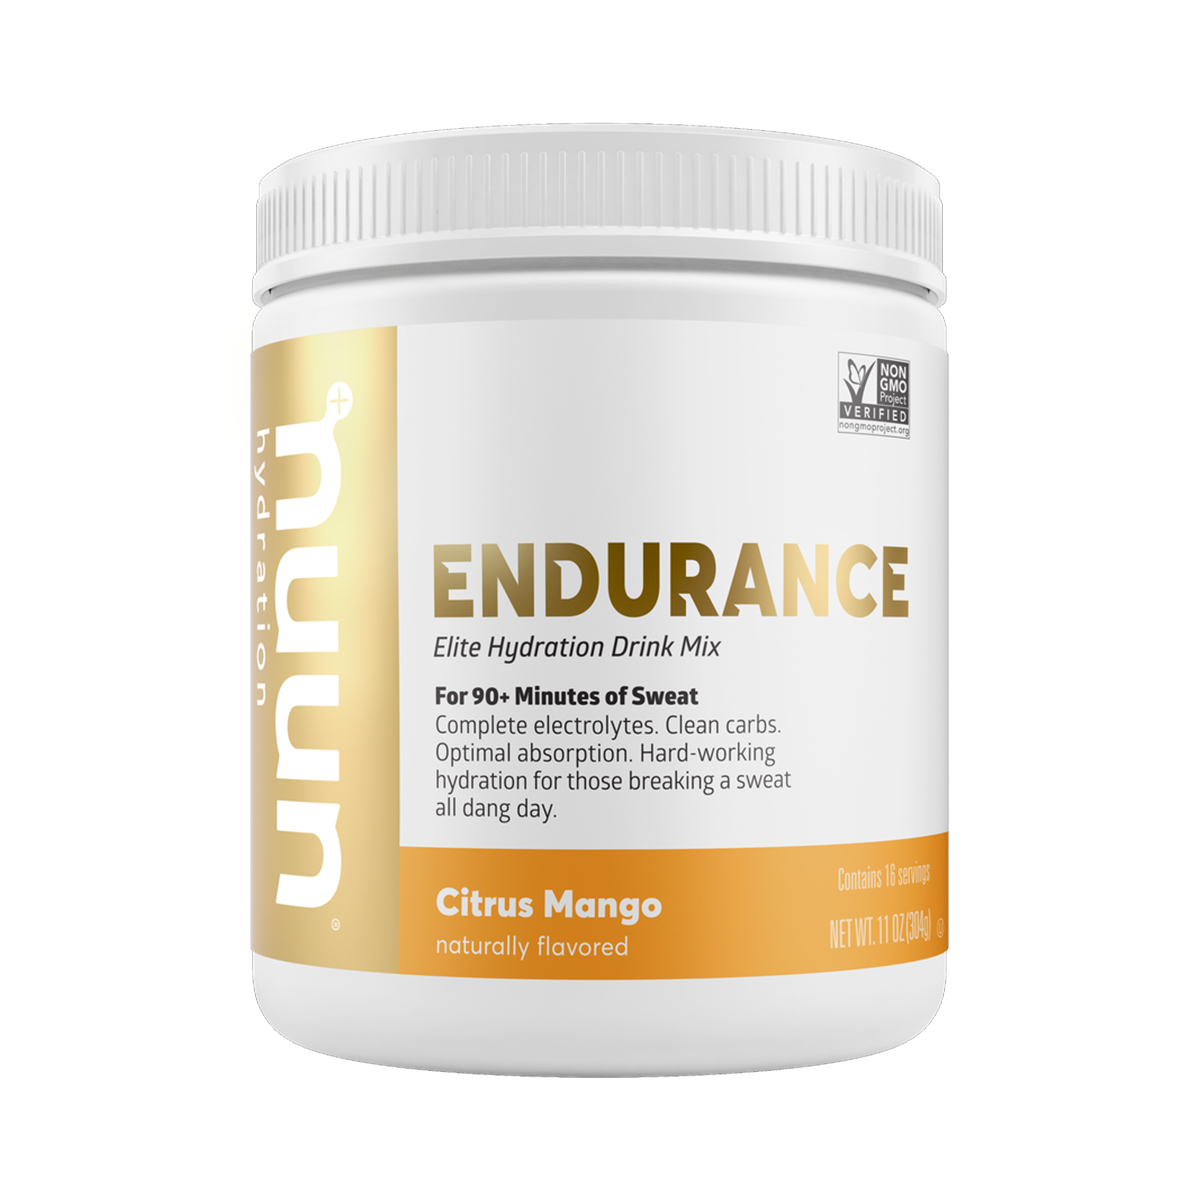 Nuun Endurance Drink Mix - Flavor: Citrus Mango - Size: Box of 12, Citrus Mango, large, image 1